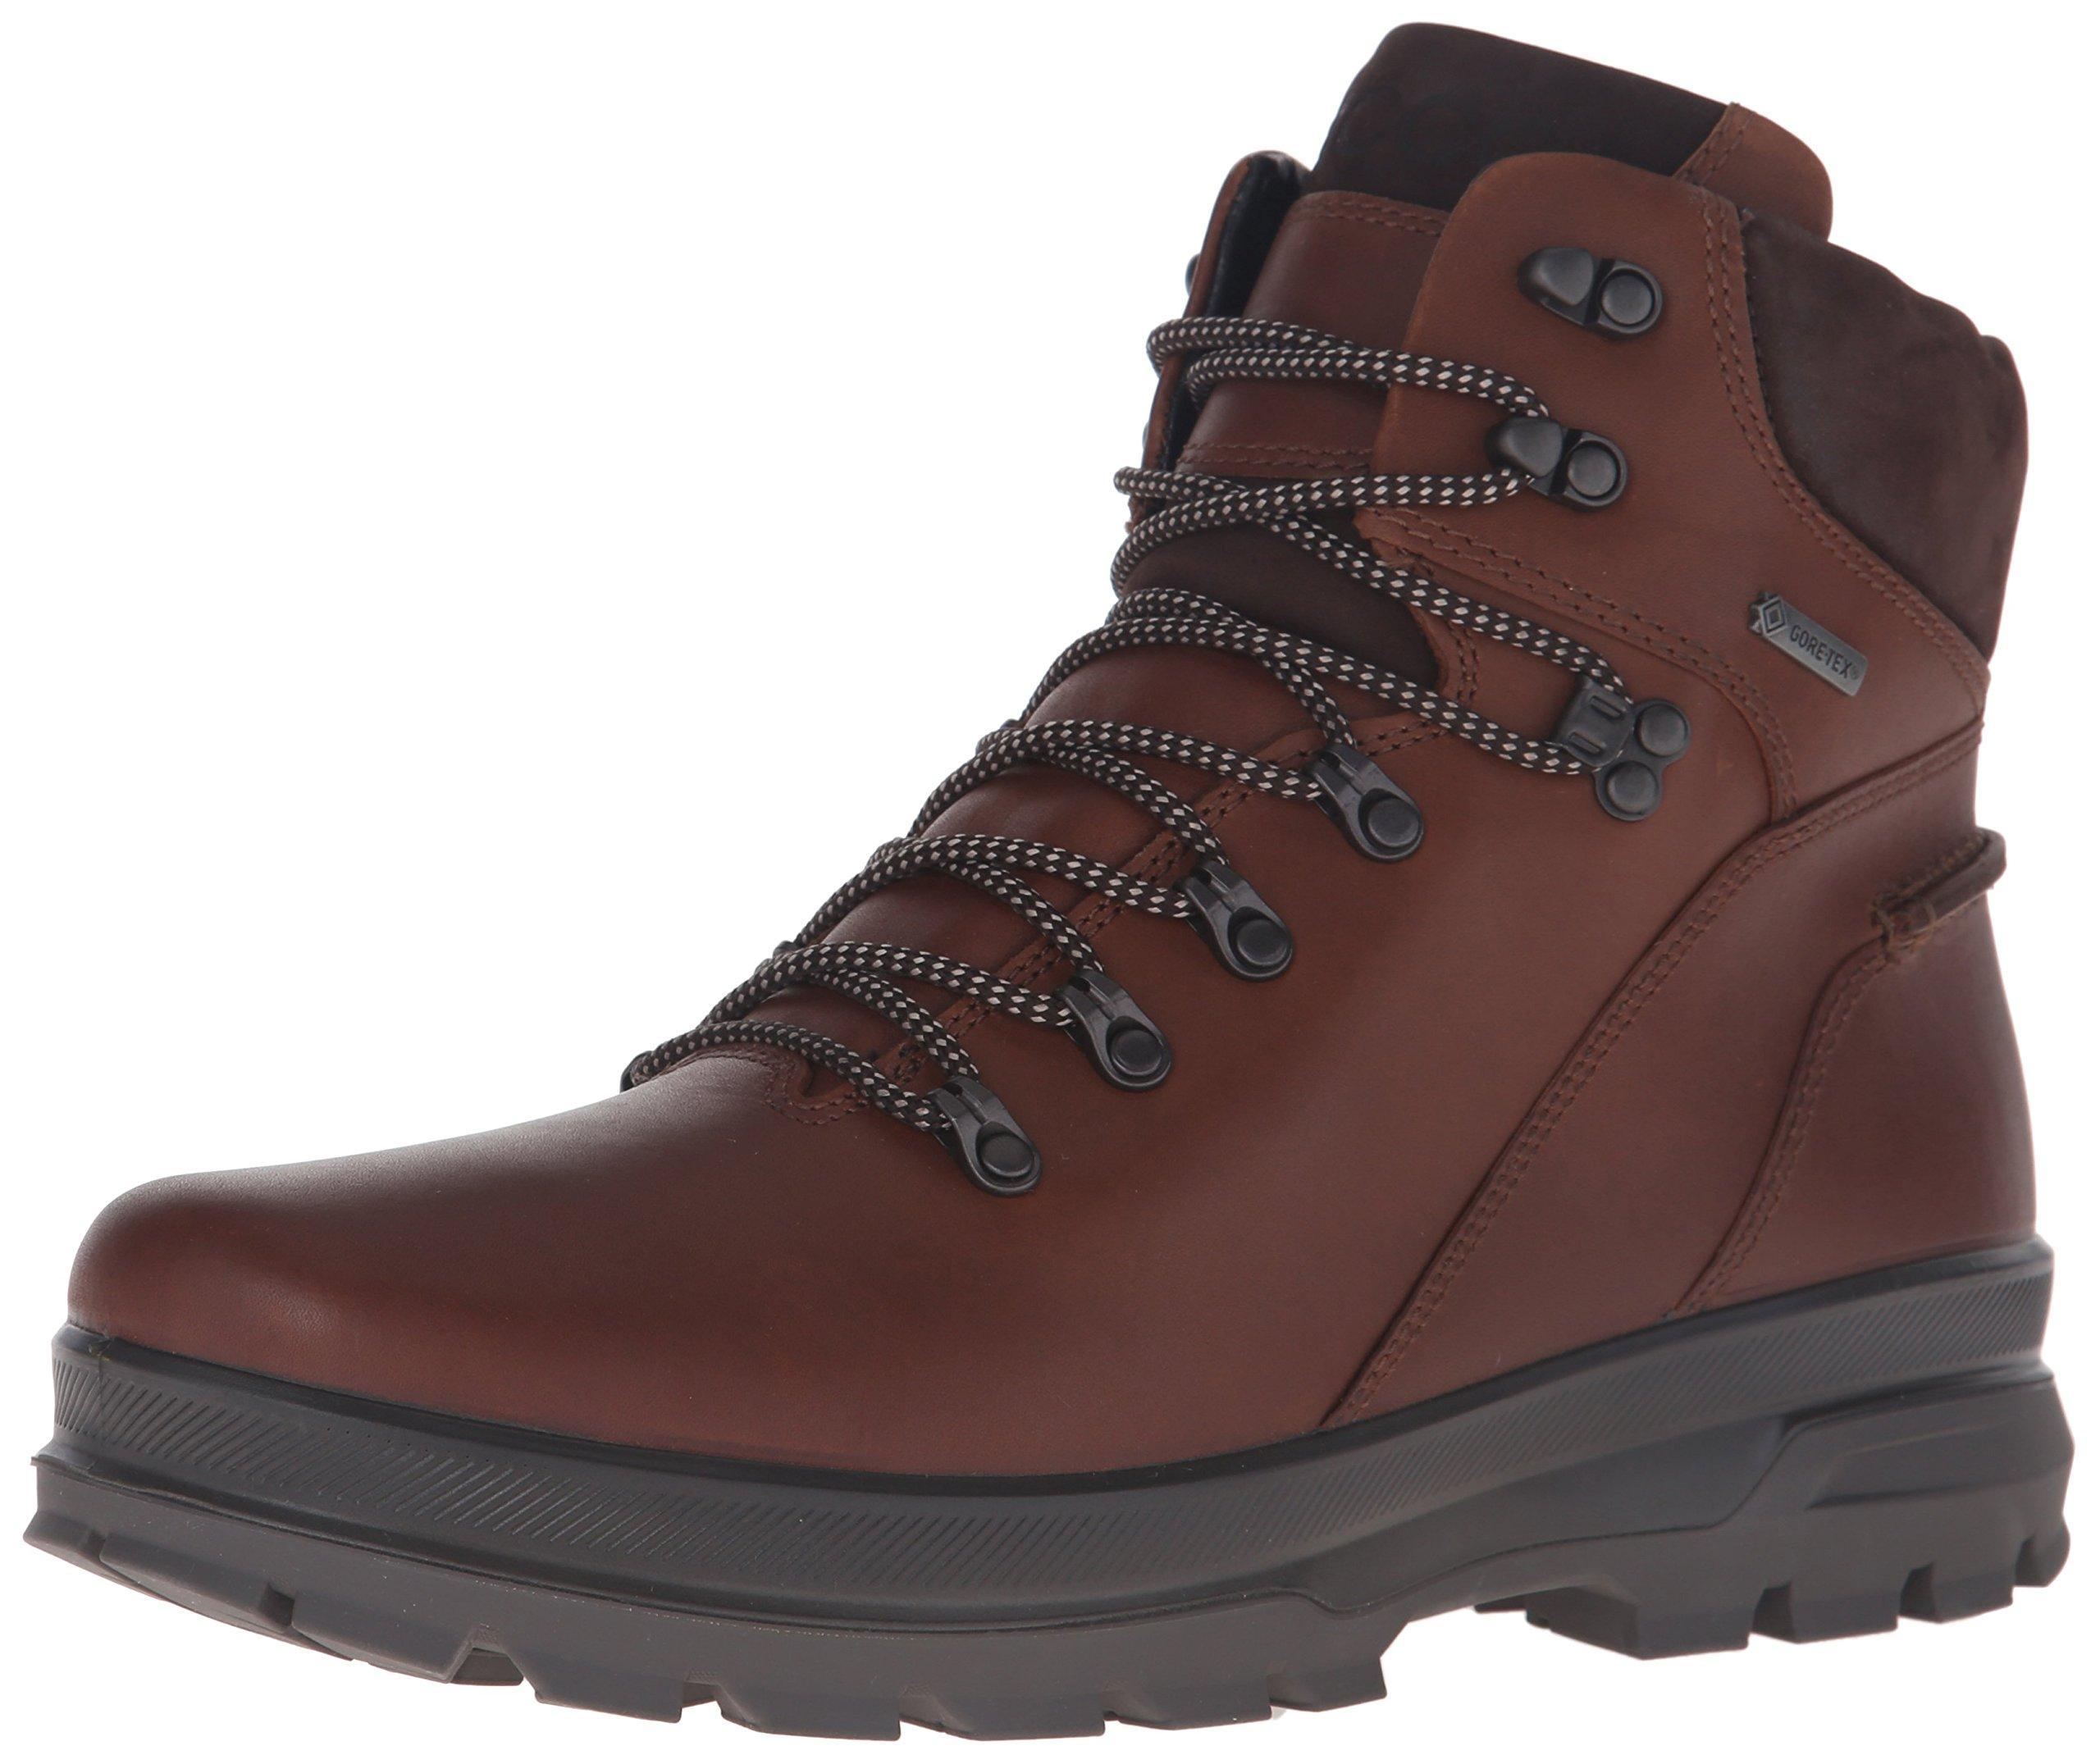 ECCO Men's Rugged Track GTX High Hiking Boot